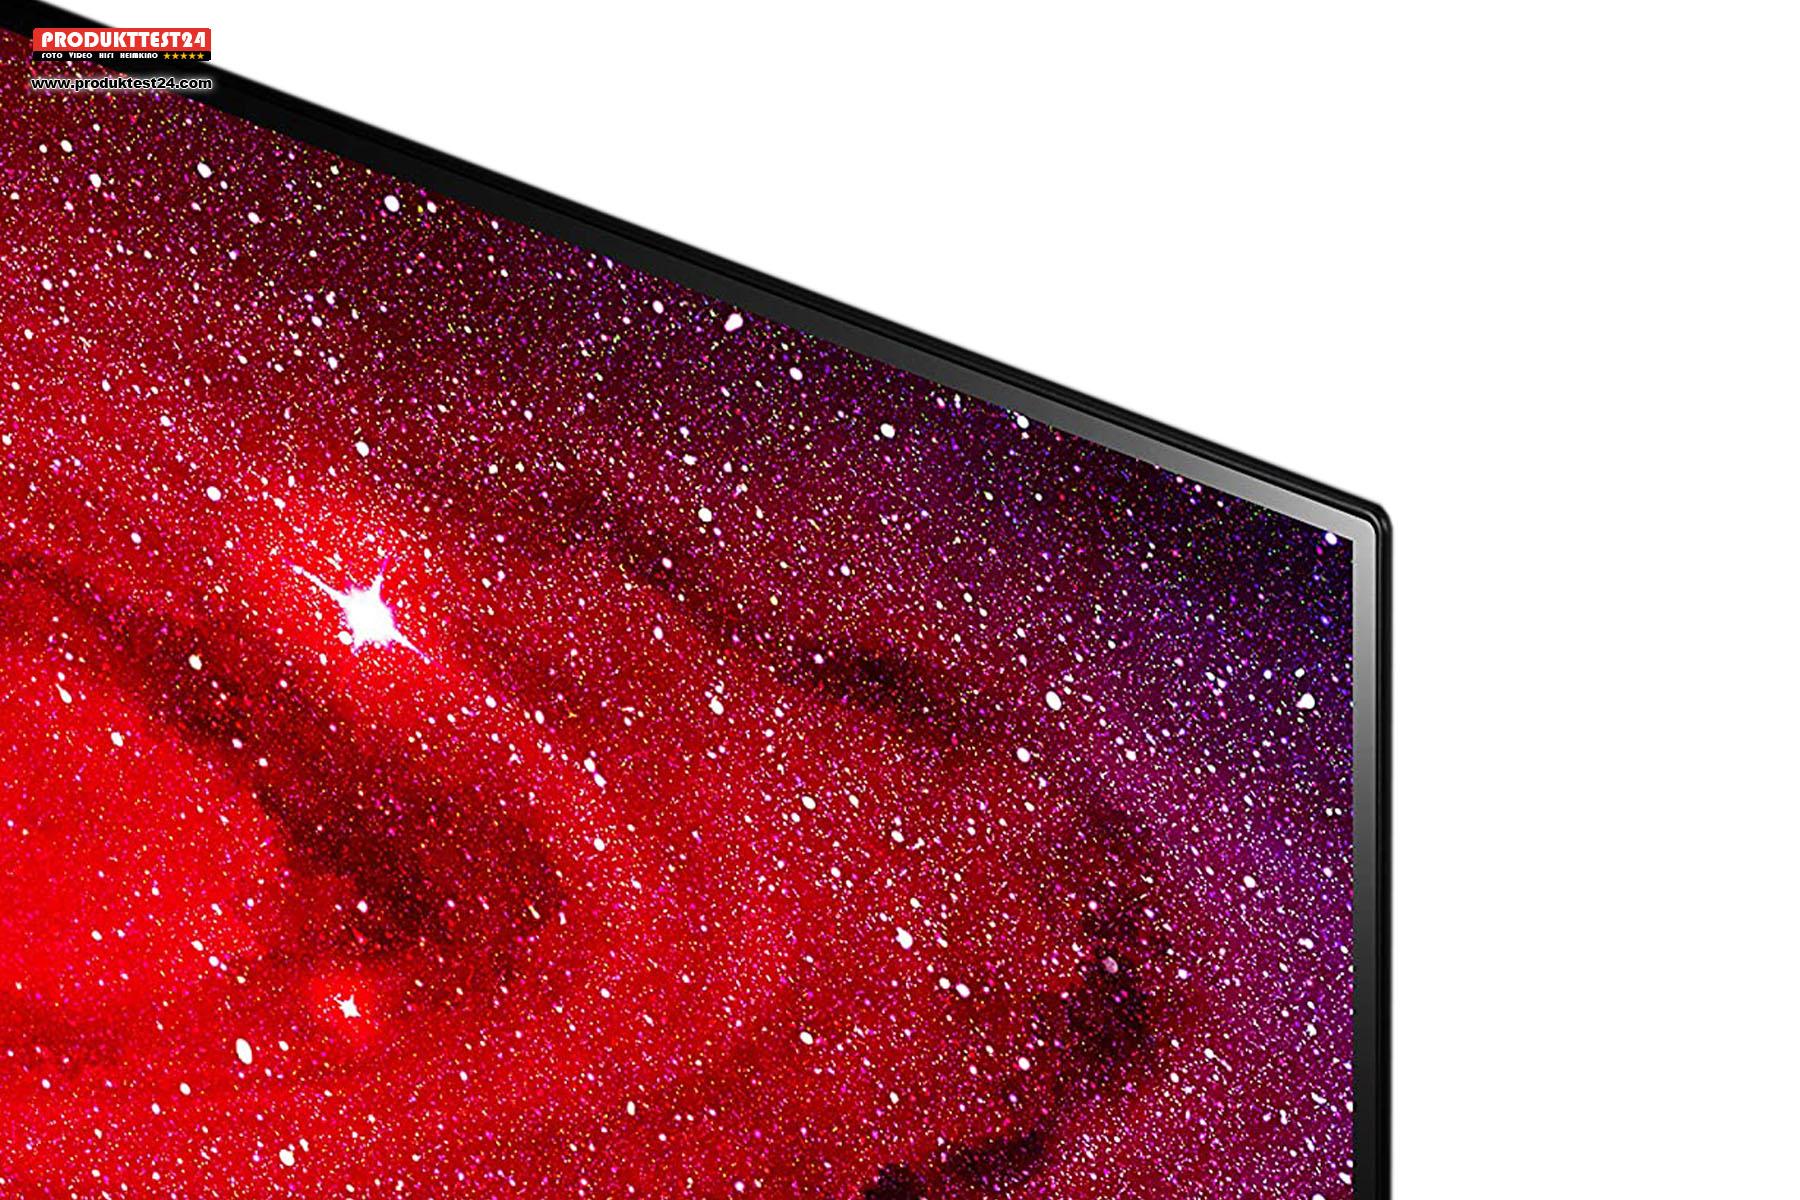 Rahmenloses Design- Das Display des LG OLED65CX geht bis zur Kante des Rahmens.